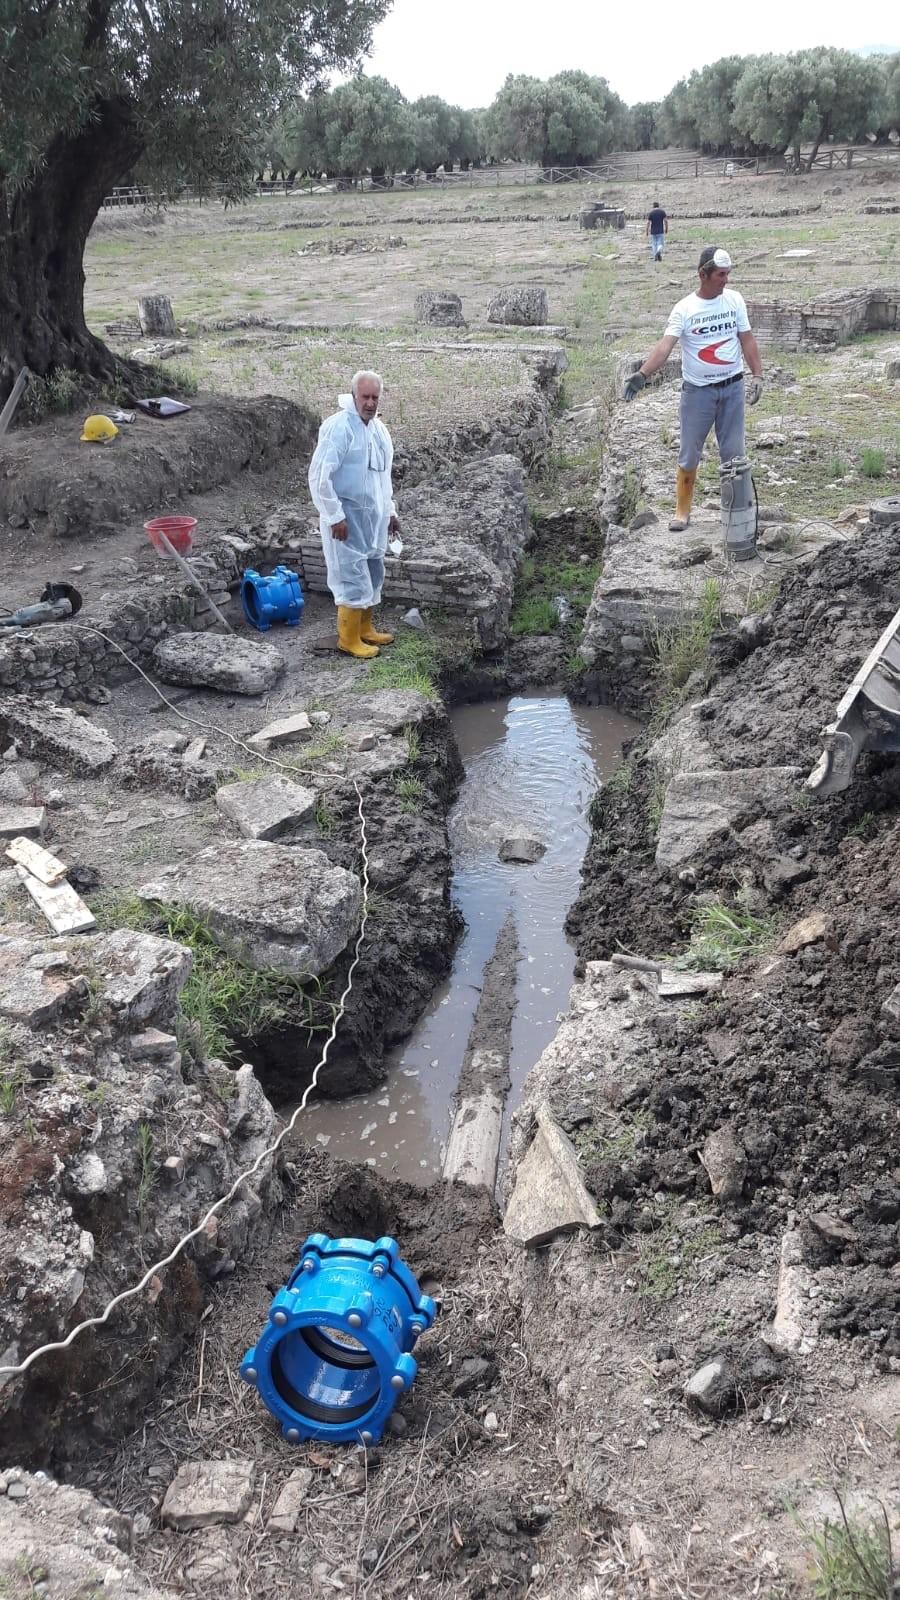 Intervento nel Parco Archeologico Scolacium 66ef0cd8 3081 4c12 a629 98a8edd76c3b